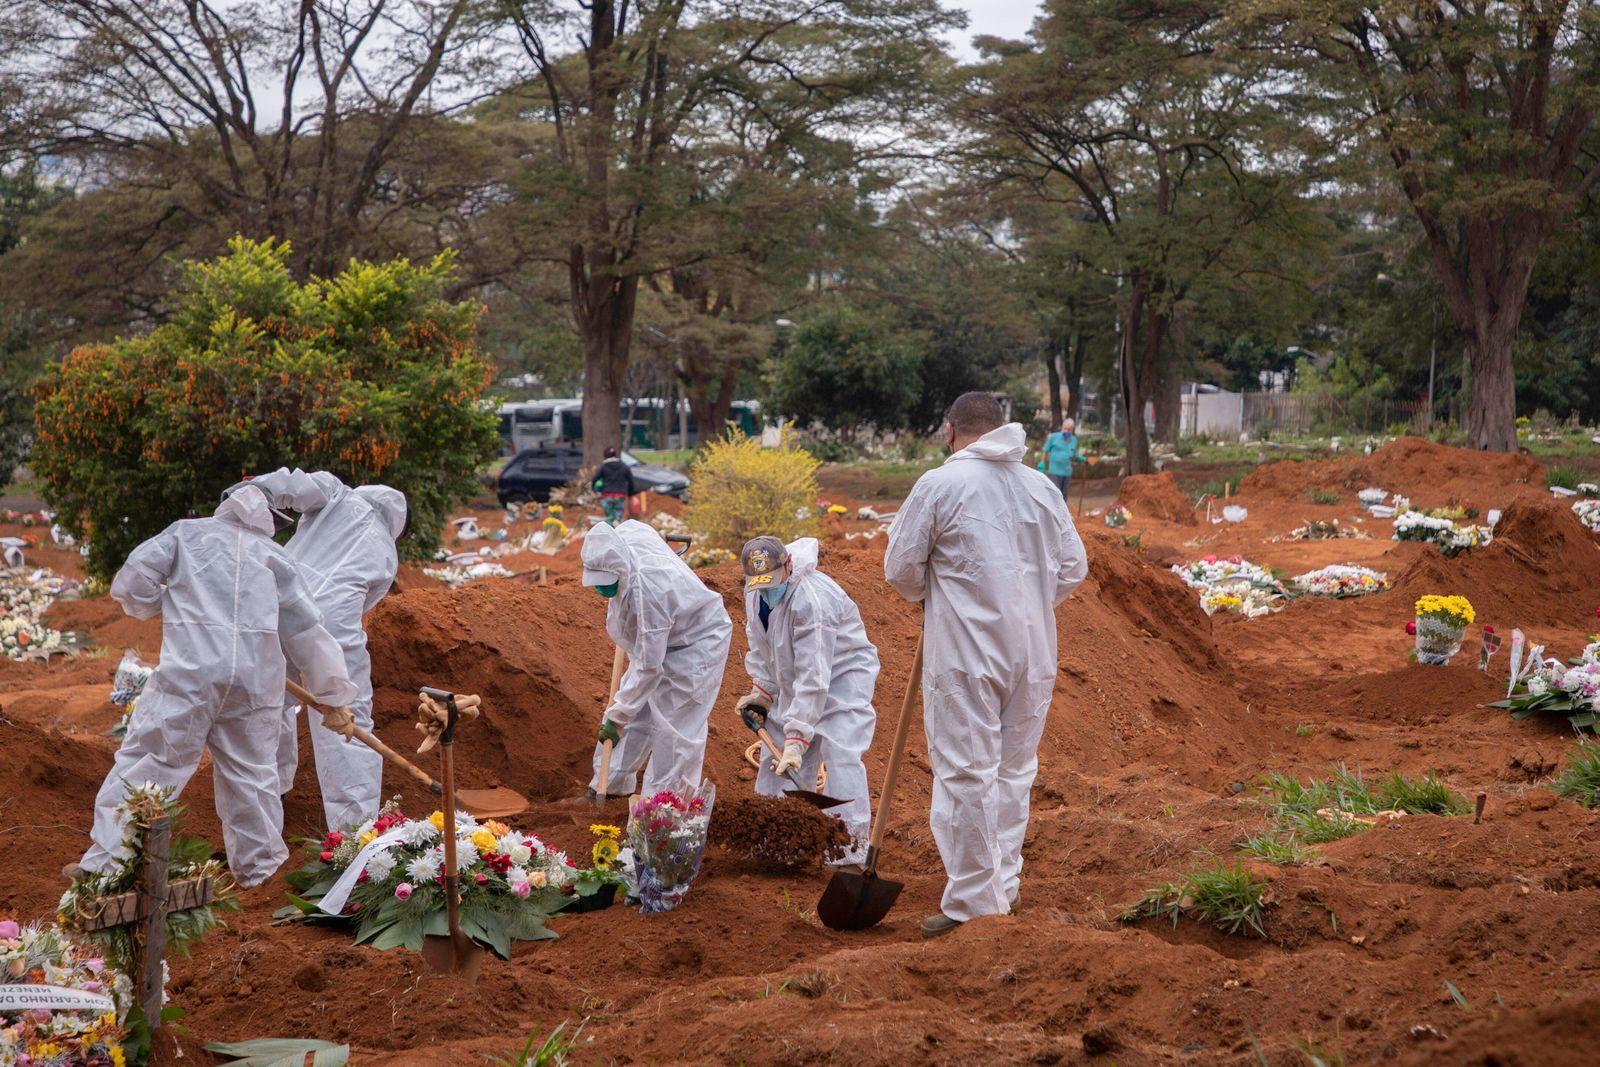 SÃO PAULO, SP - 16.06.2020: ENTERROS CEMITÉRIO VILA FORMOSA - Families follow the burial of relatives who were victims